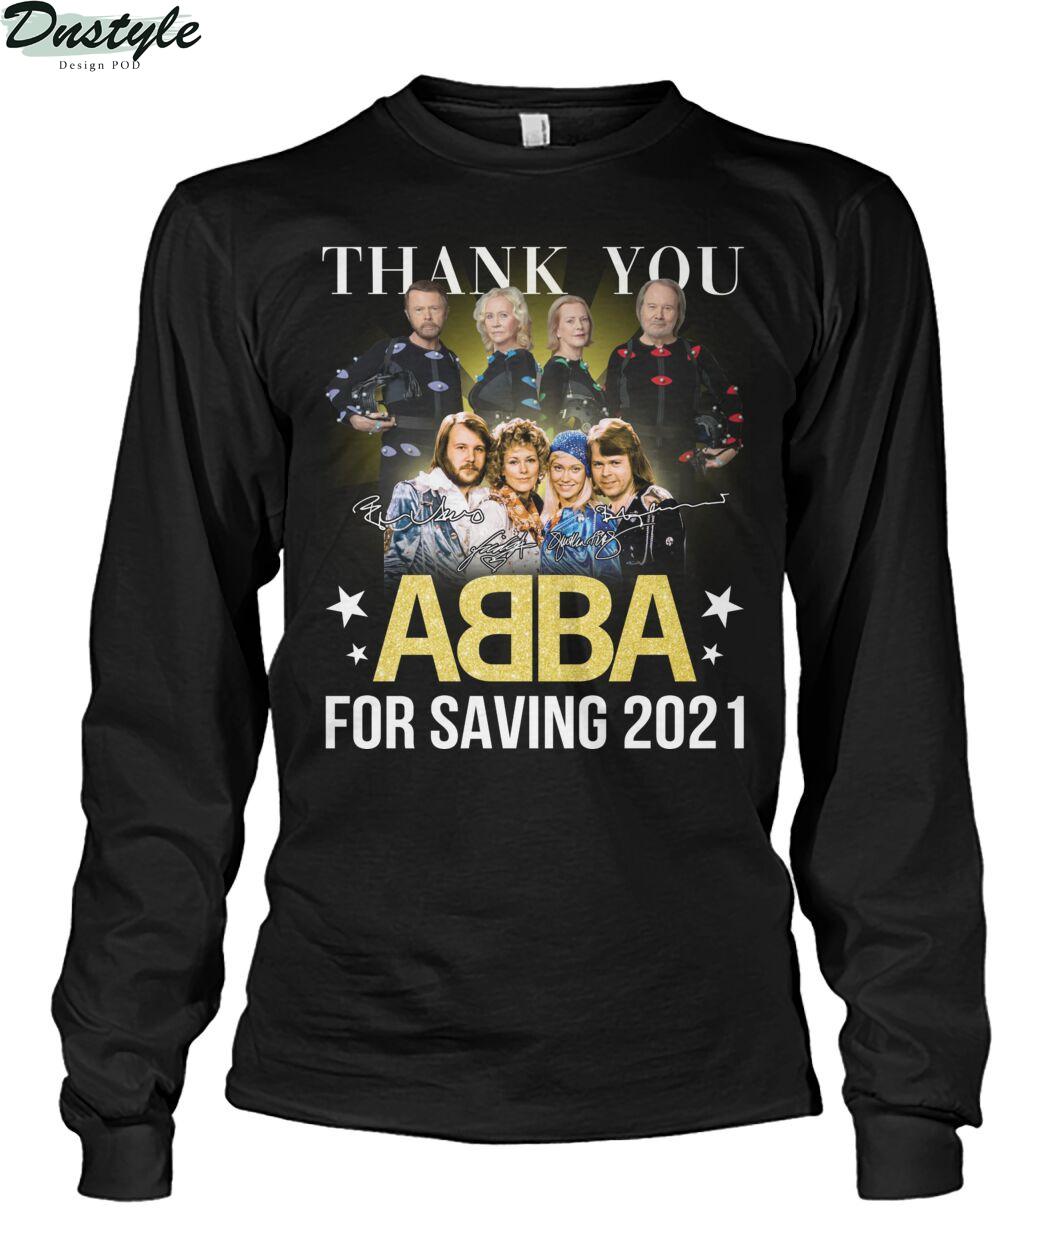 Thank you ABBA for saving 2021 long sleeve